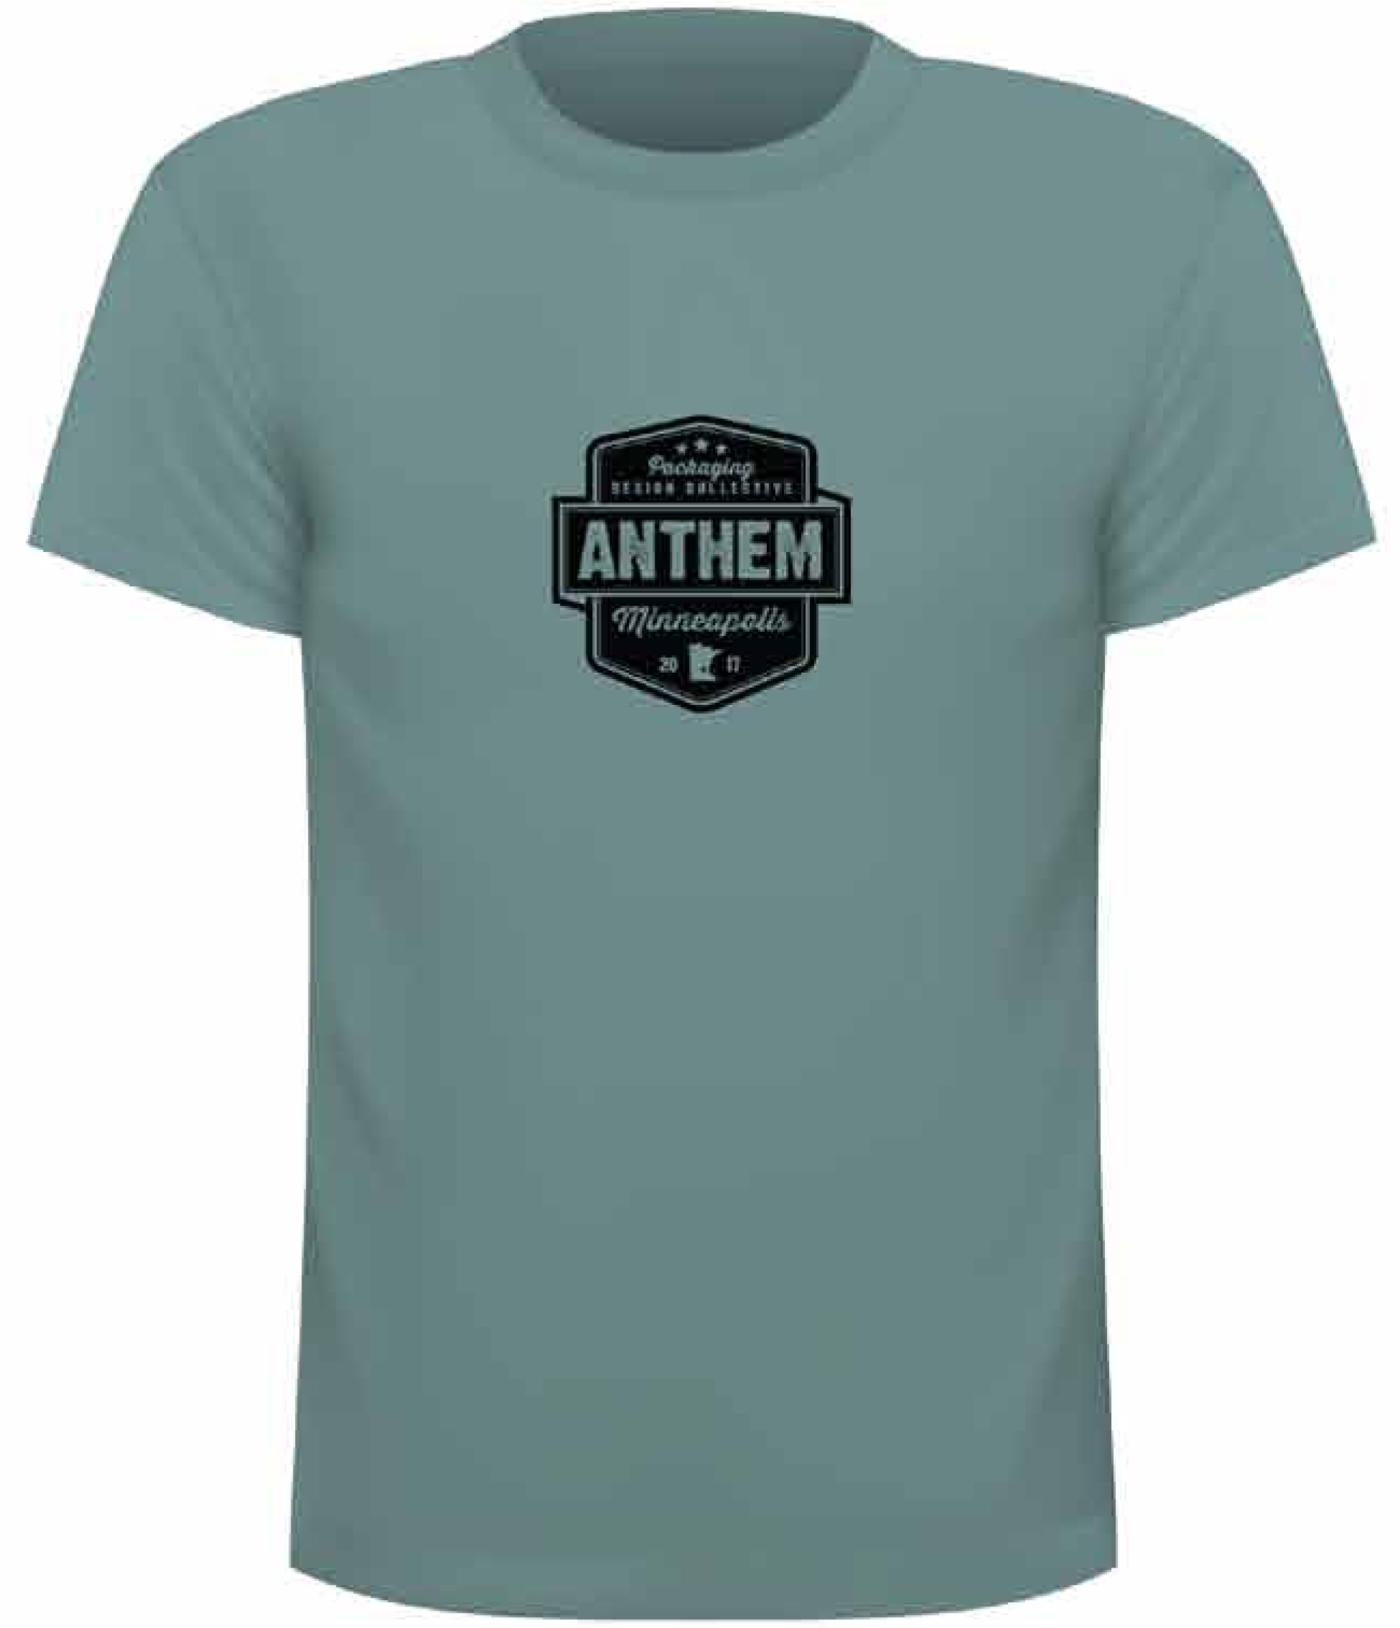 T Shirt Design By Amy Patrick Wojahn At Coroflot